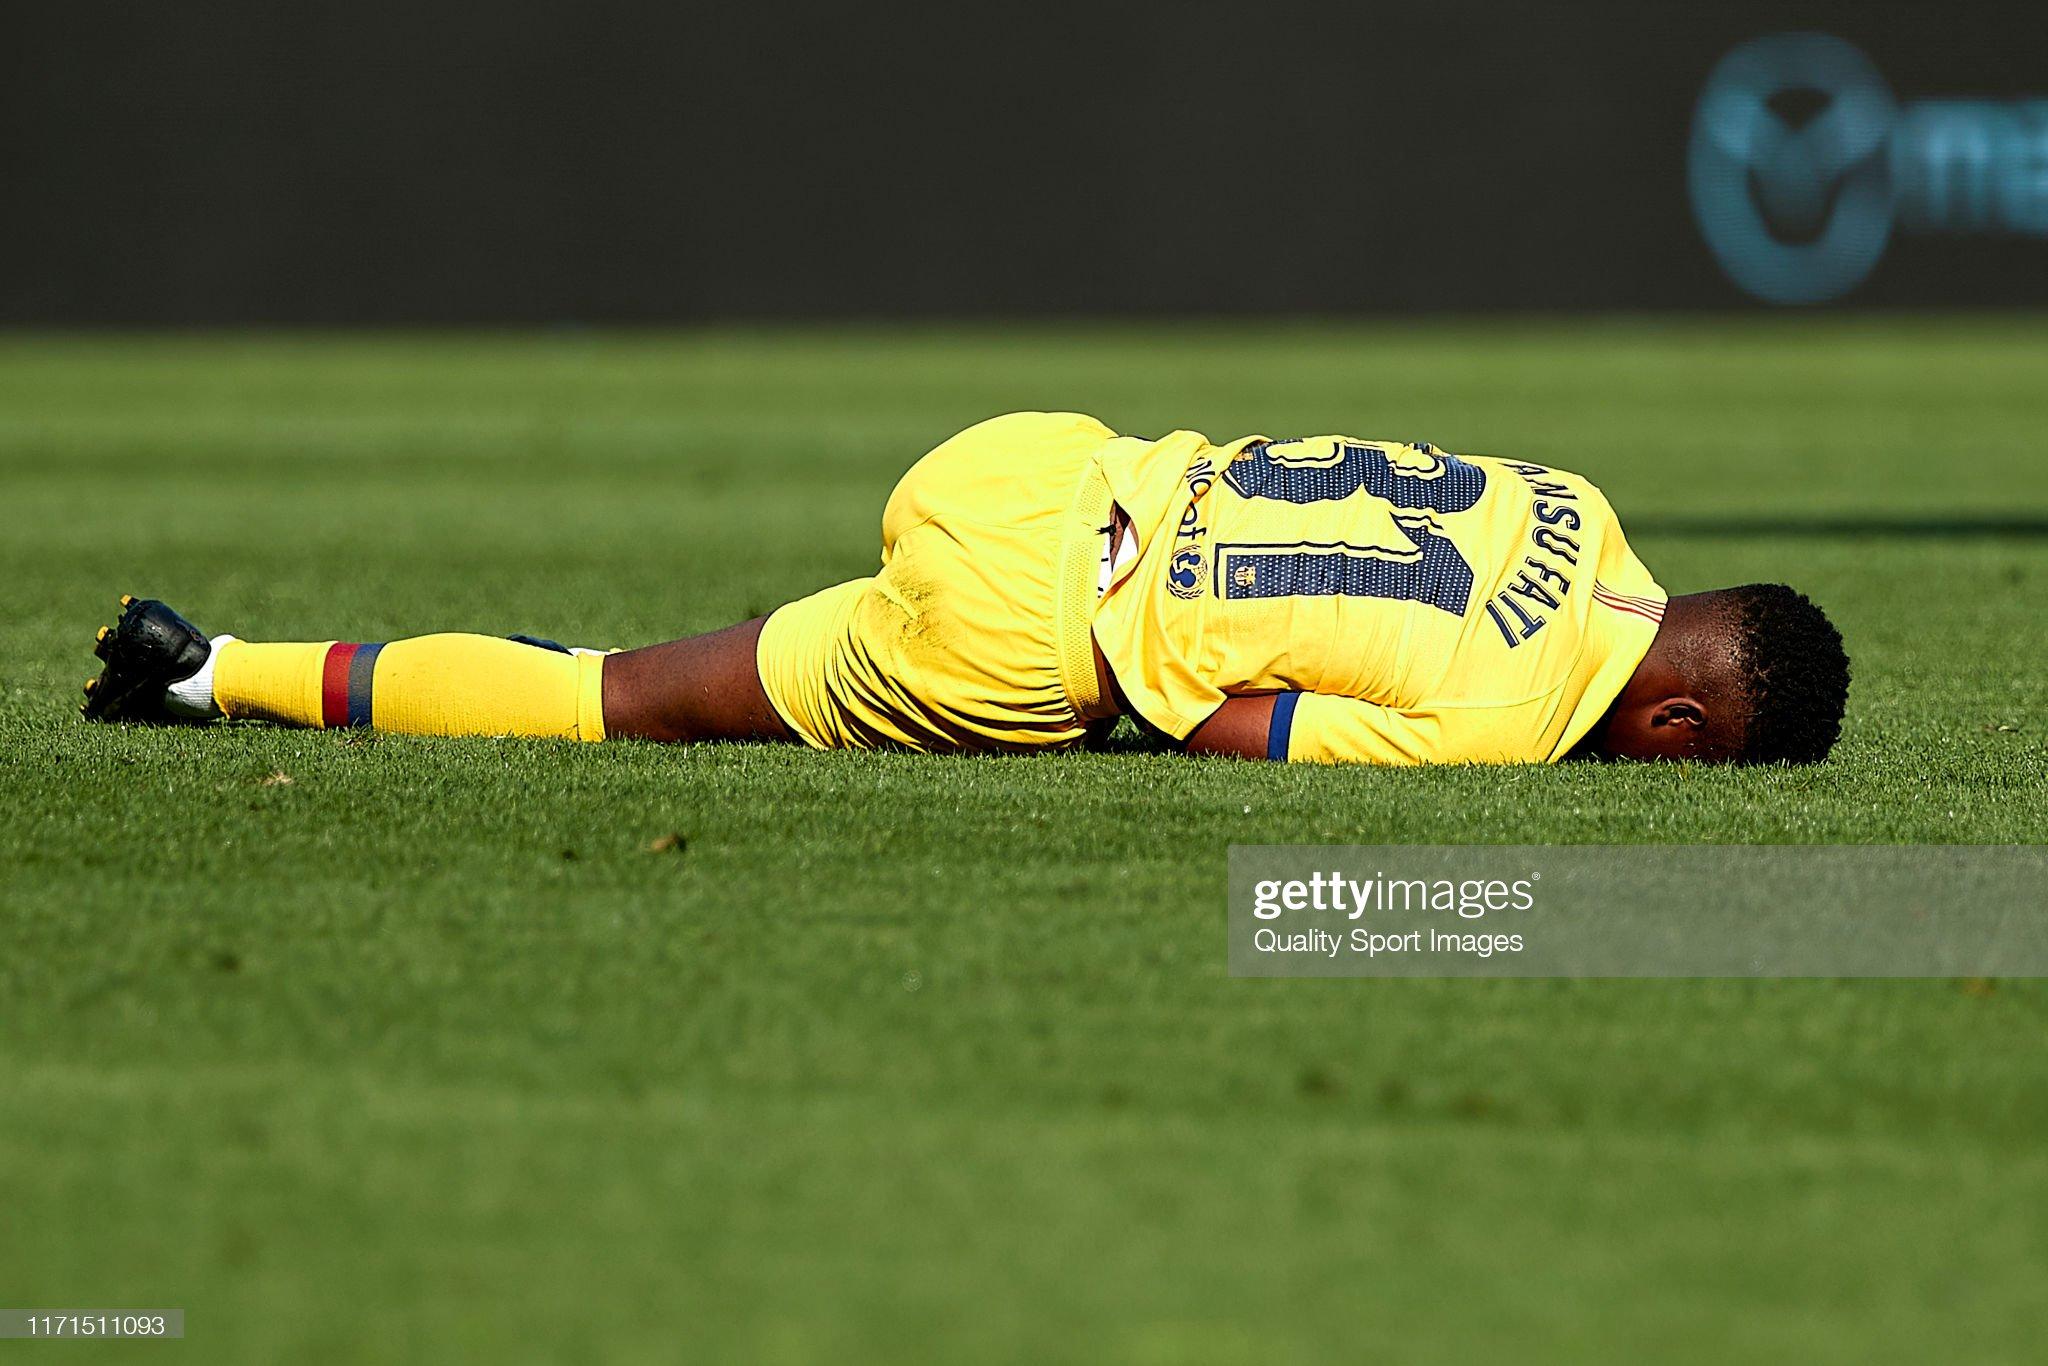 صور مباراة : أوساسونا - برشلونة 2-2 ( 31-08-2019 )  Ansu-fati-of-fc-barcelona-over-the-pitch-injured-during-the-liga-ca-picture-id1171511093?s=2048x2048